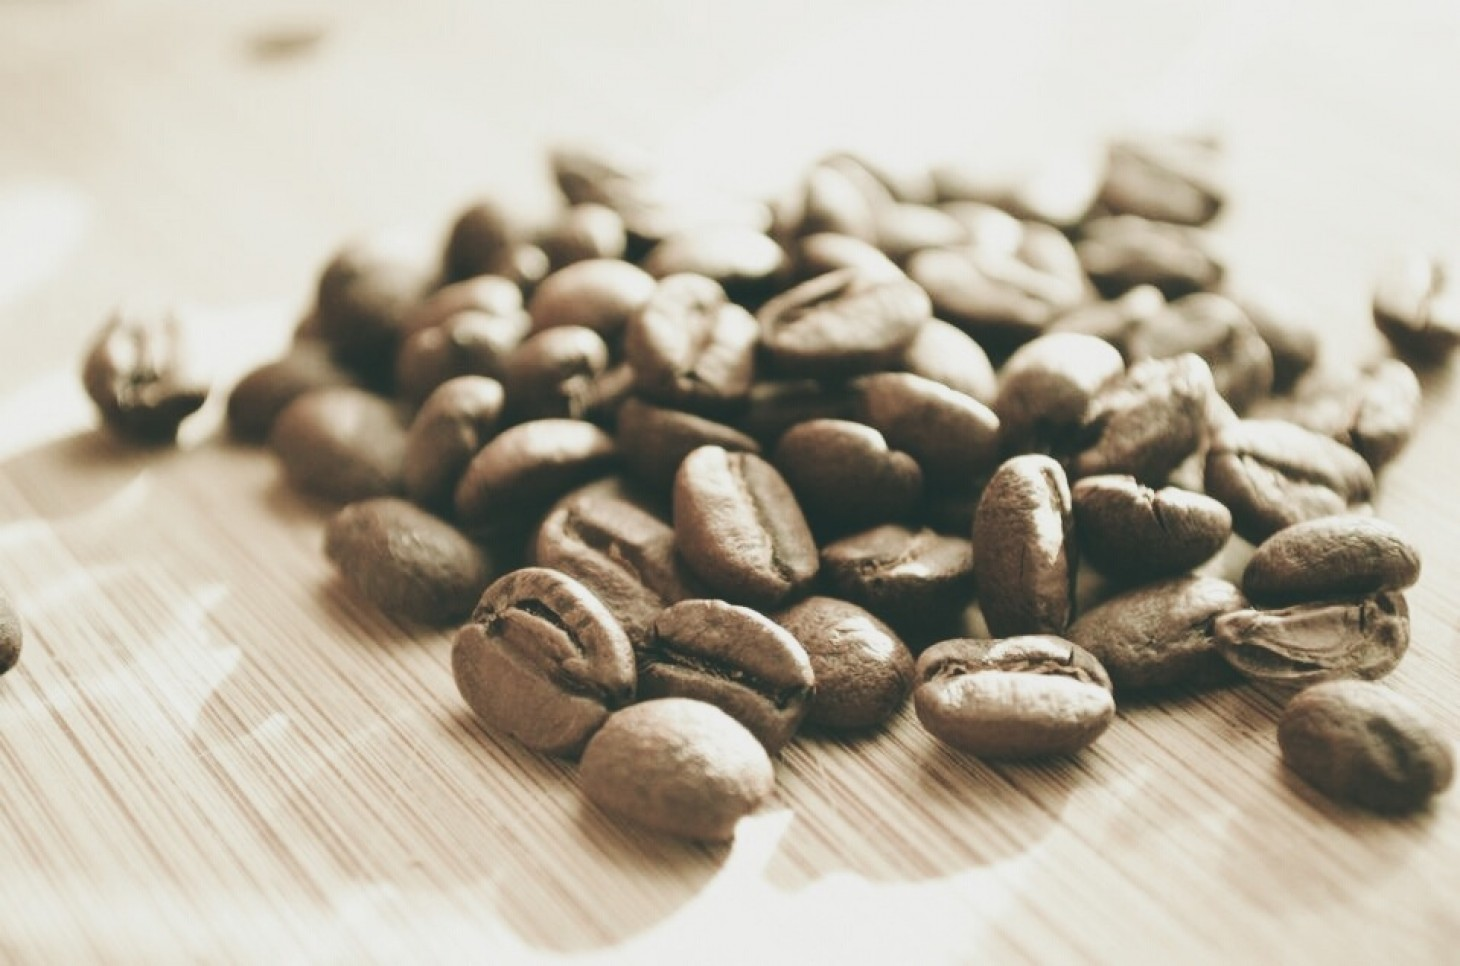 Green or Roasted Coffee